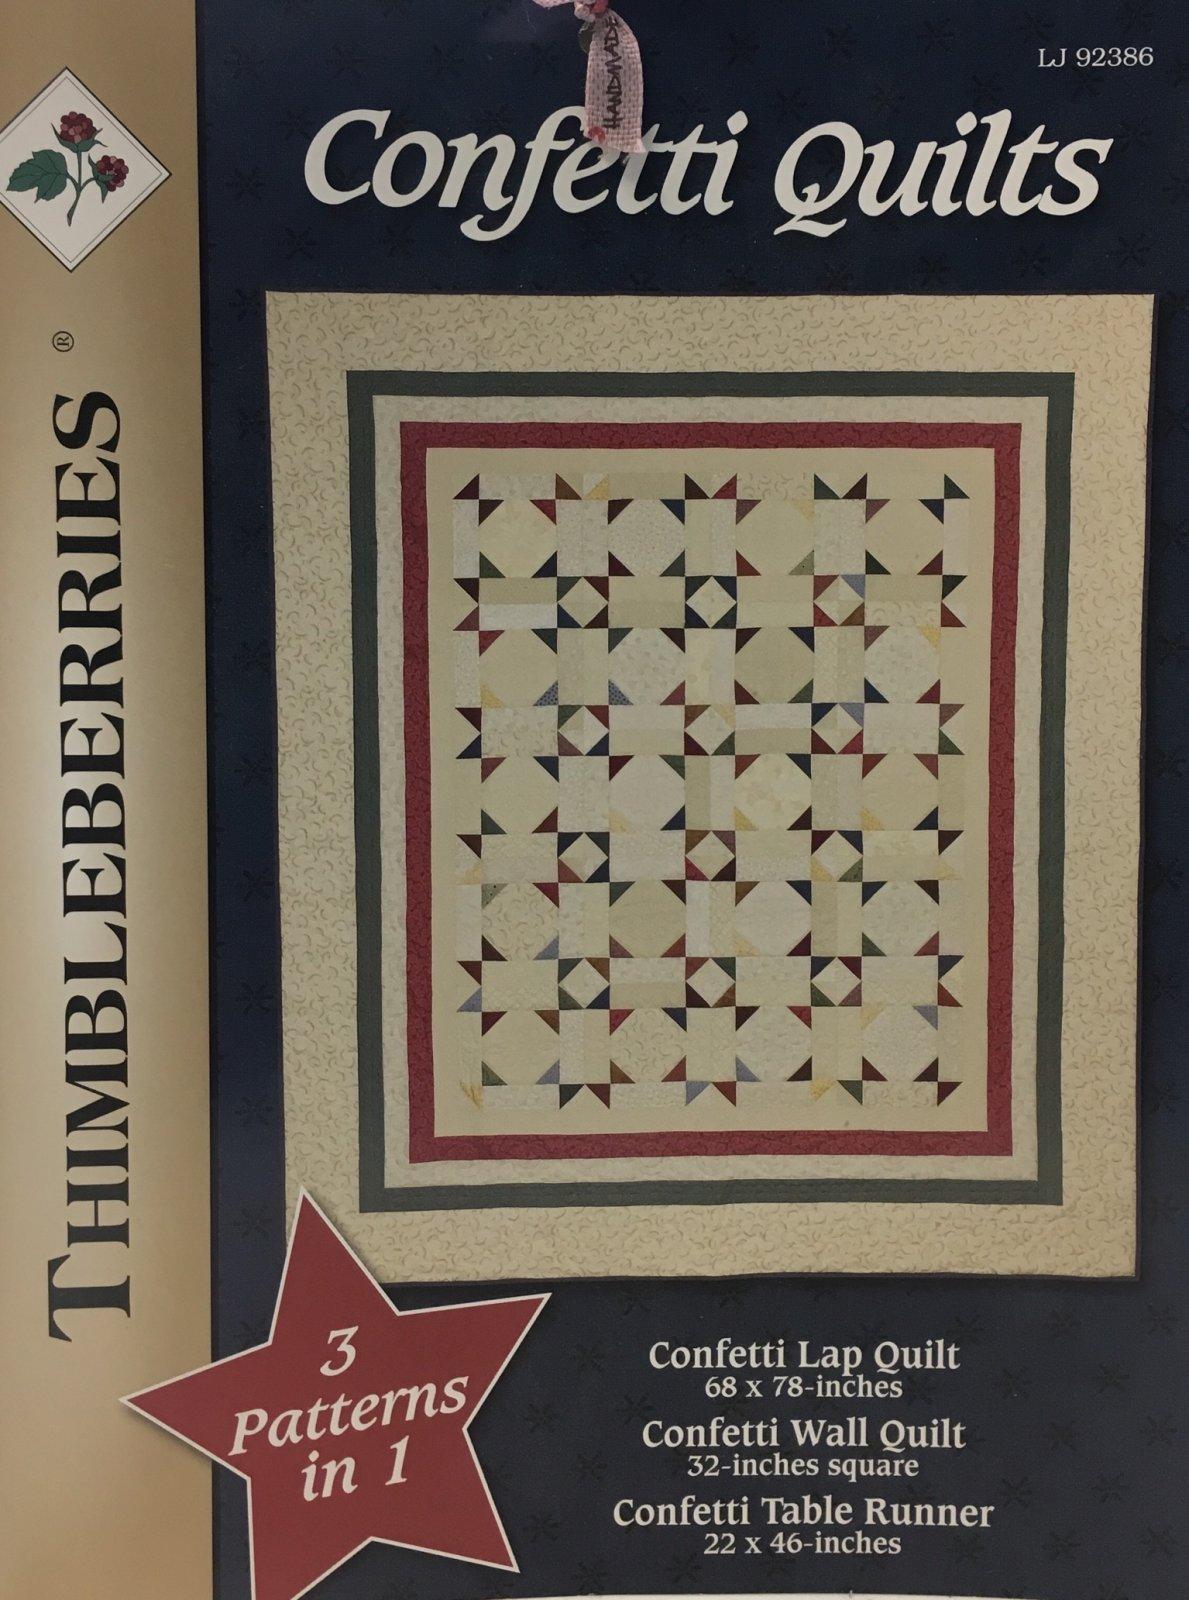 Confetti Quilt Kit